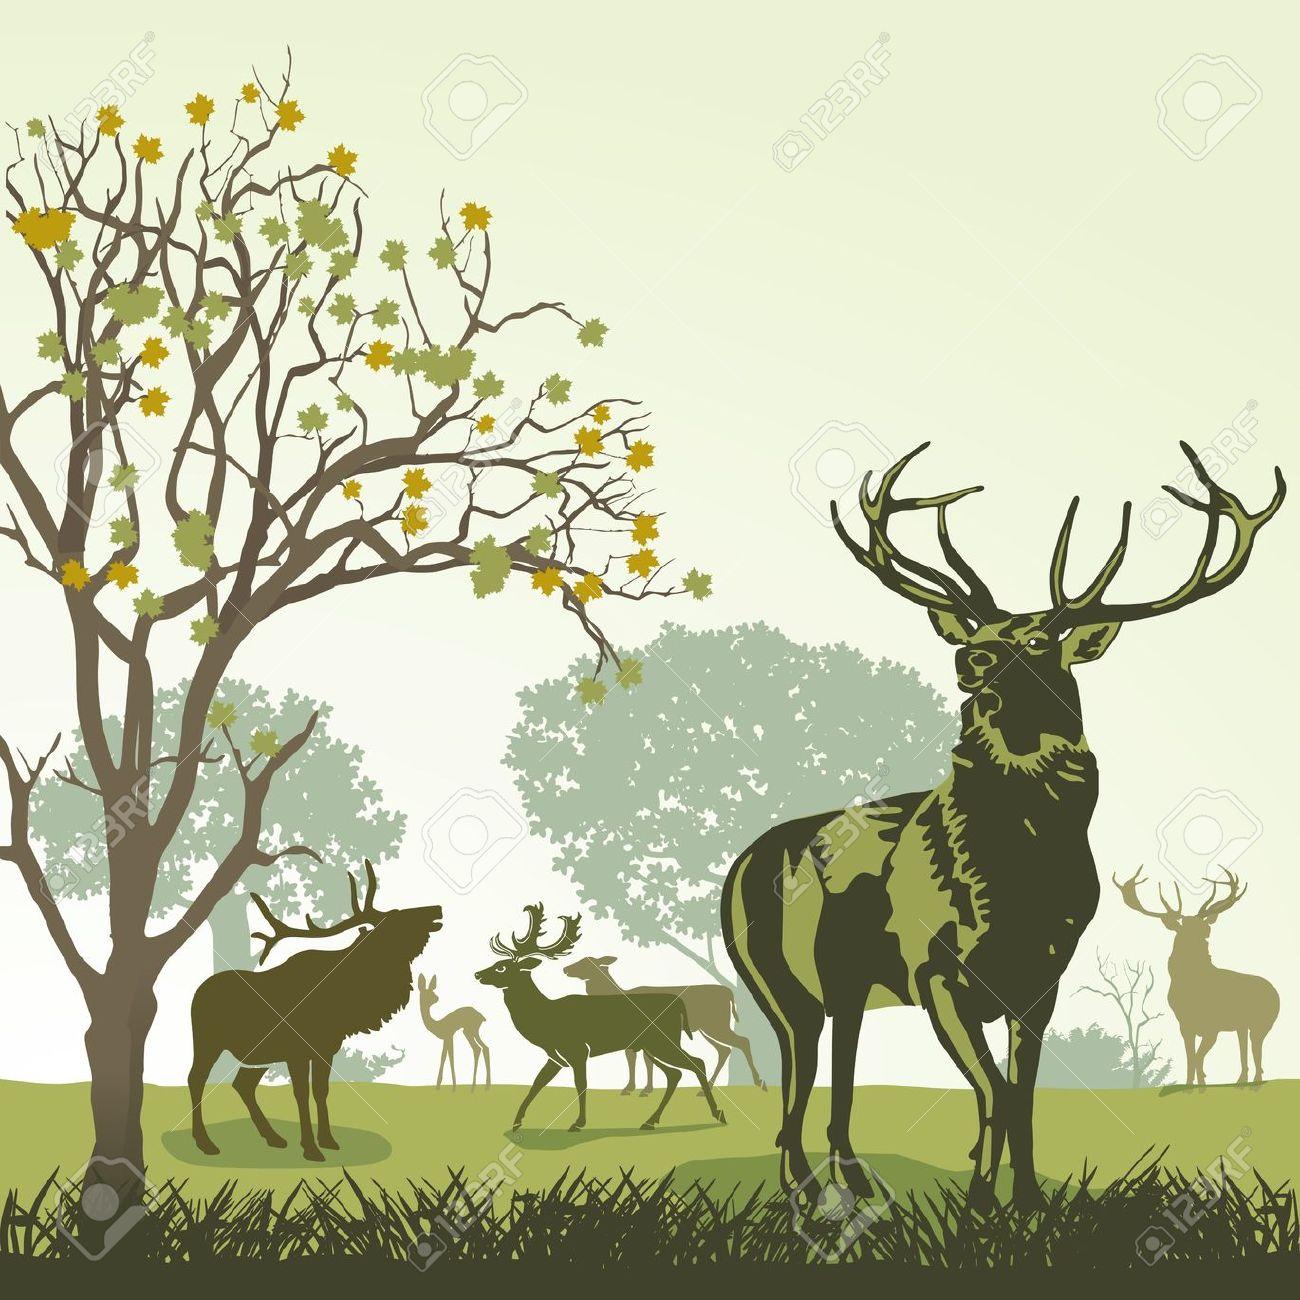 Wildlife clipart  Wildlife clipart Download Free